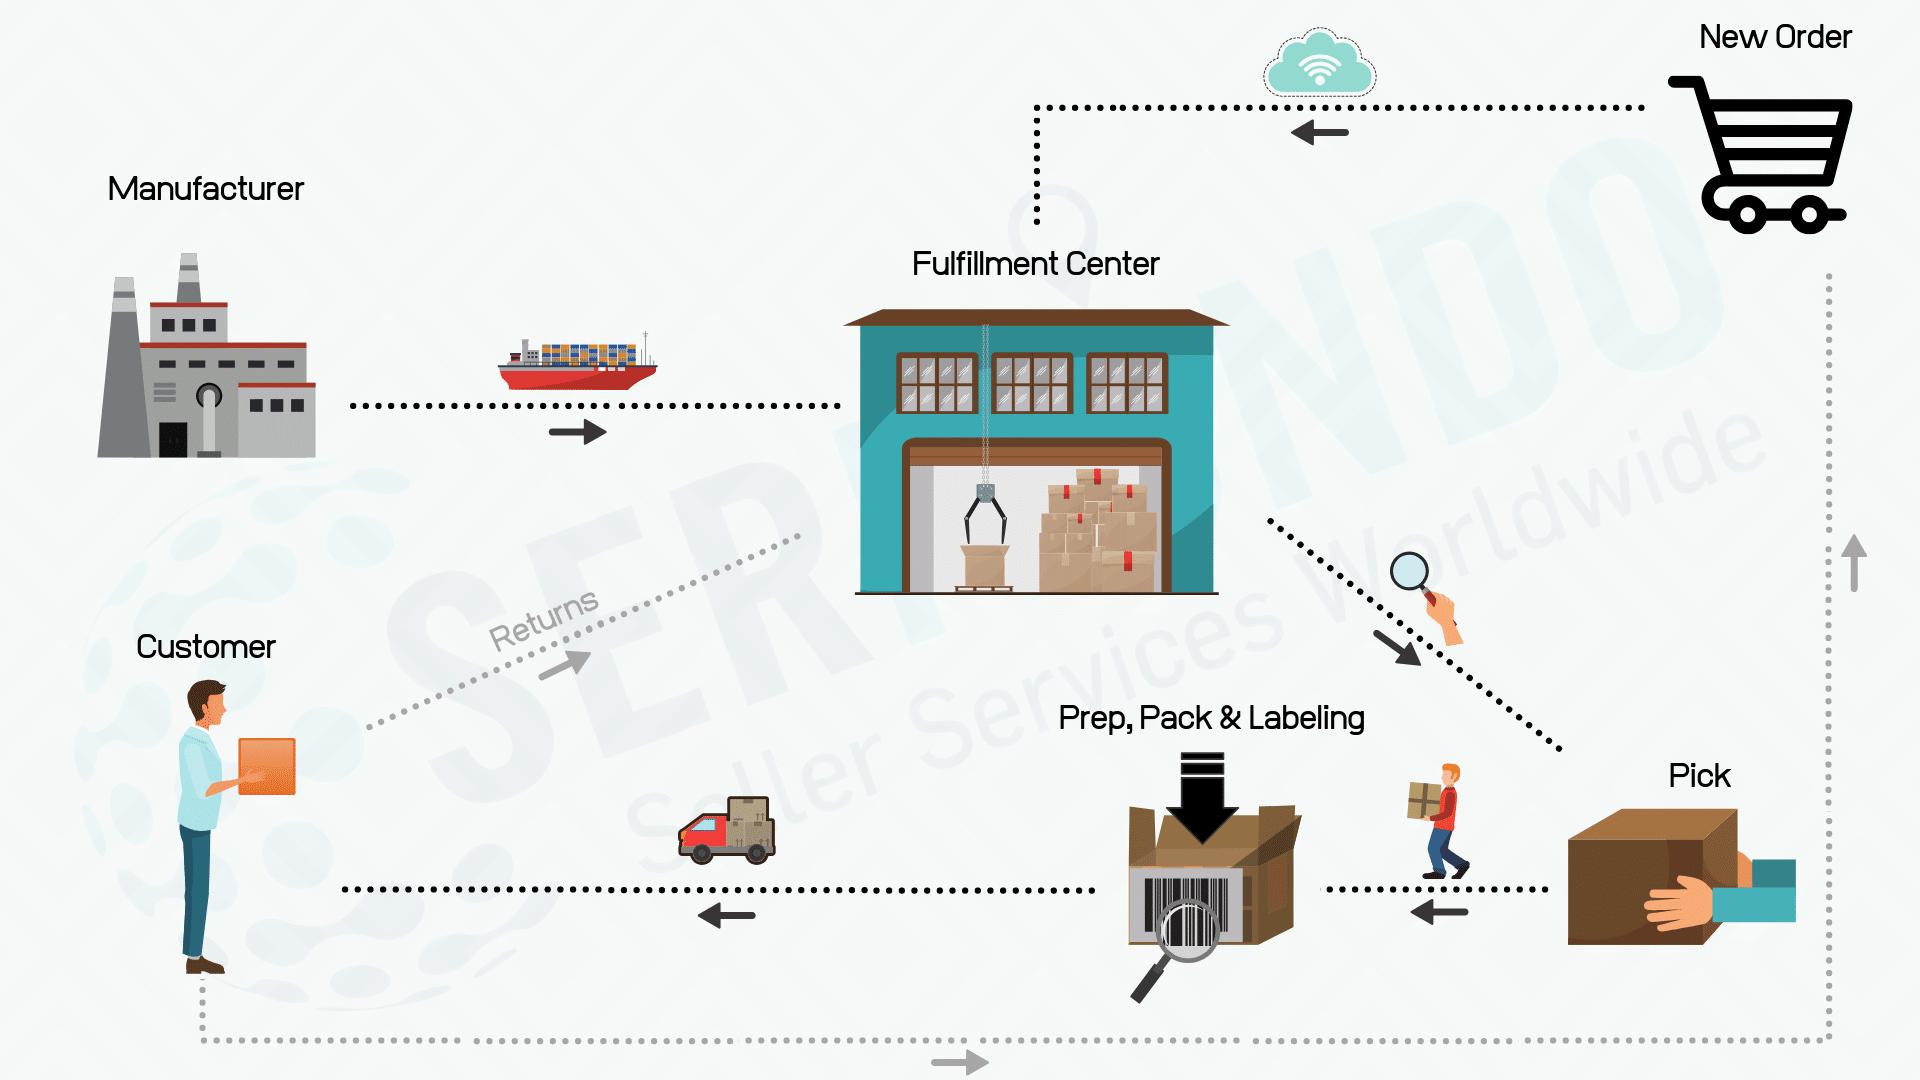 The logistics process when using a fulfillment center